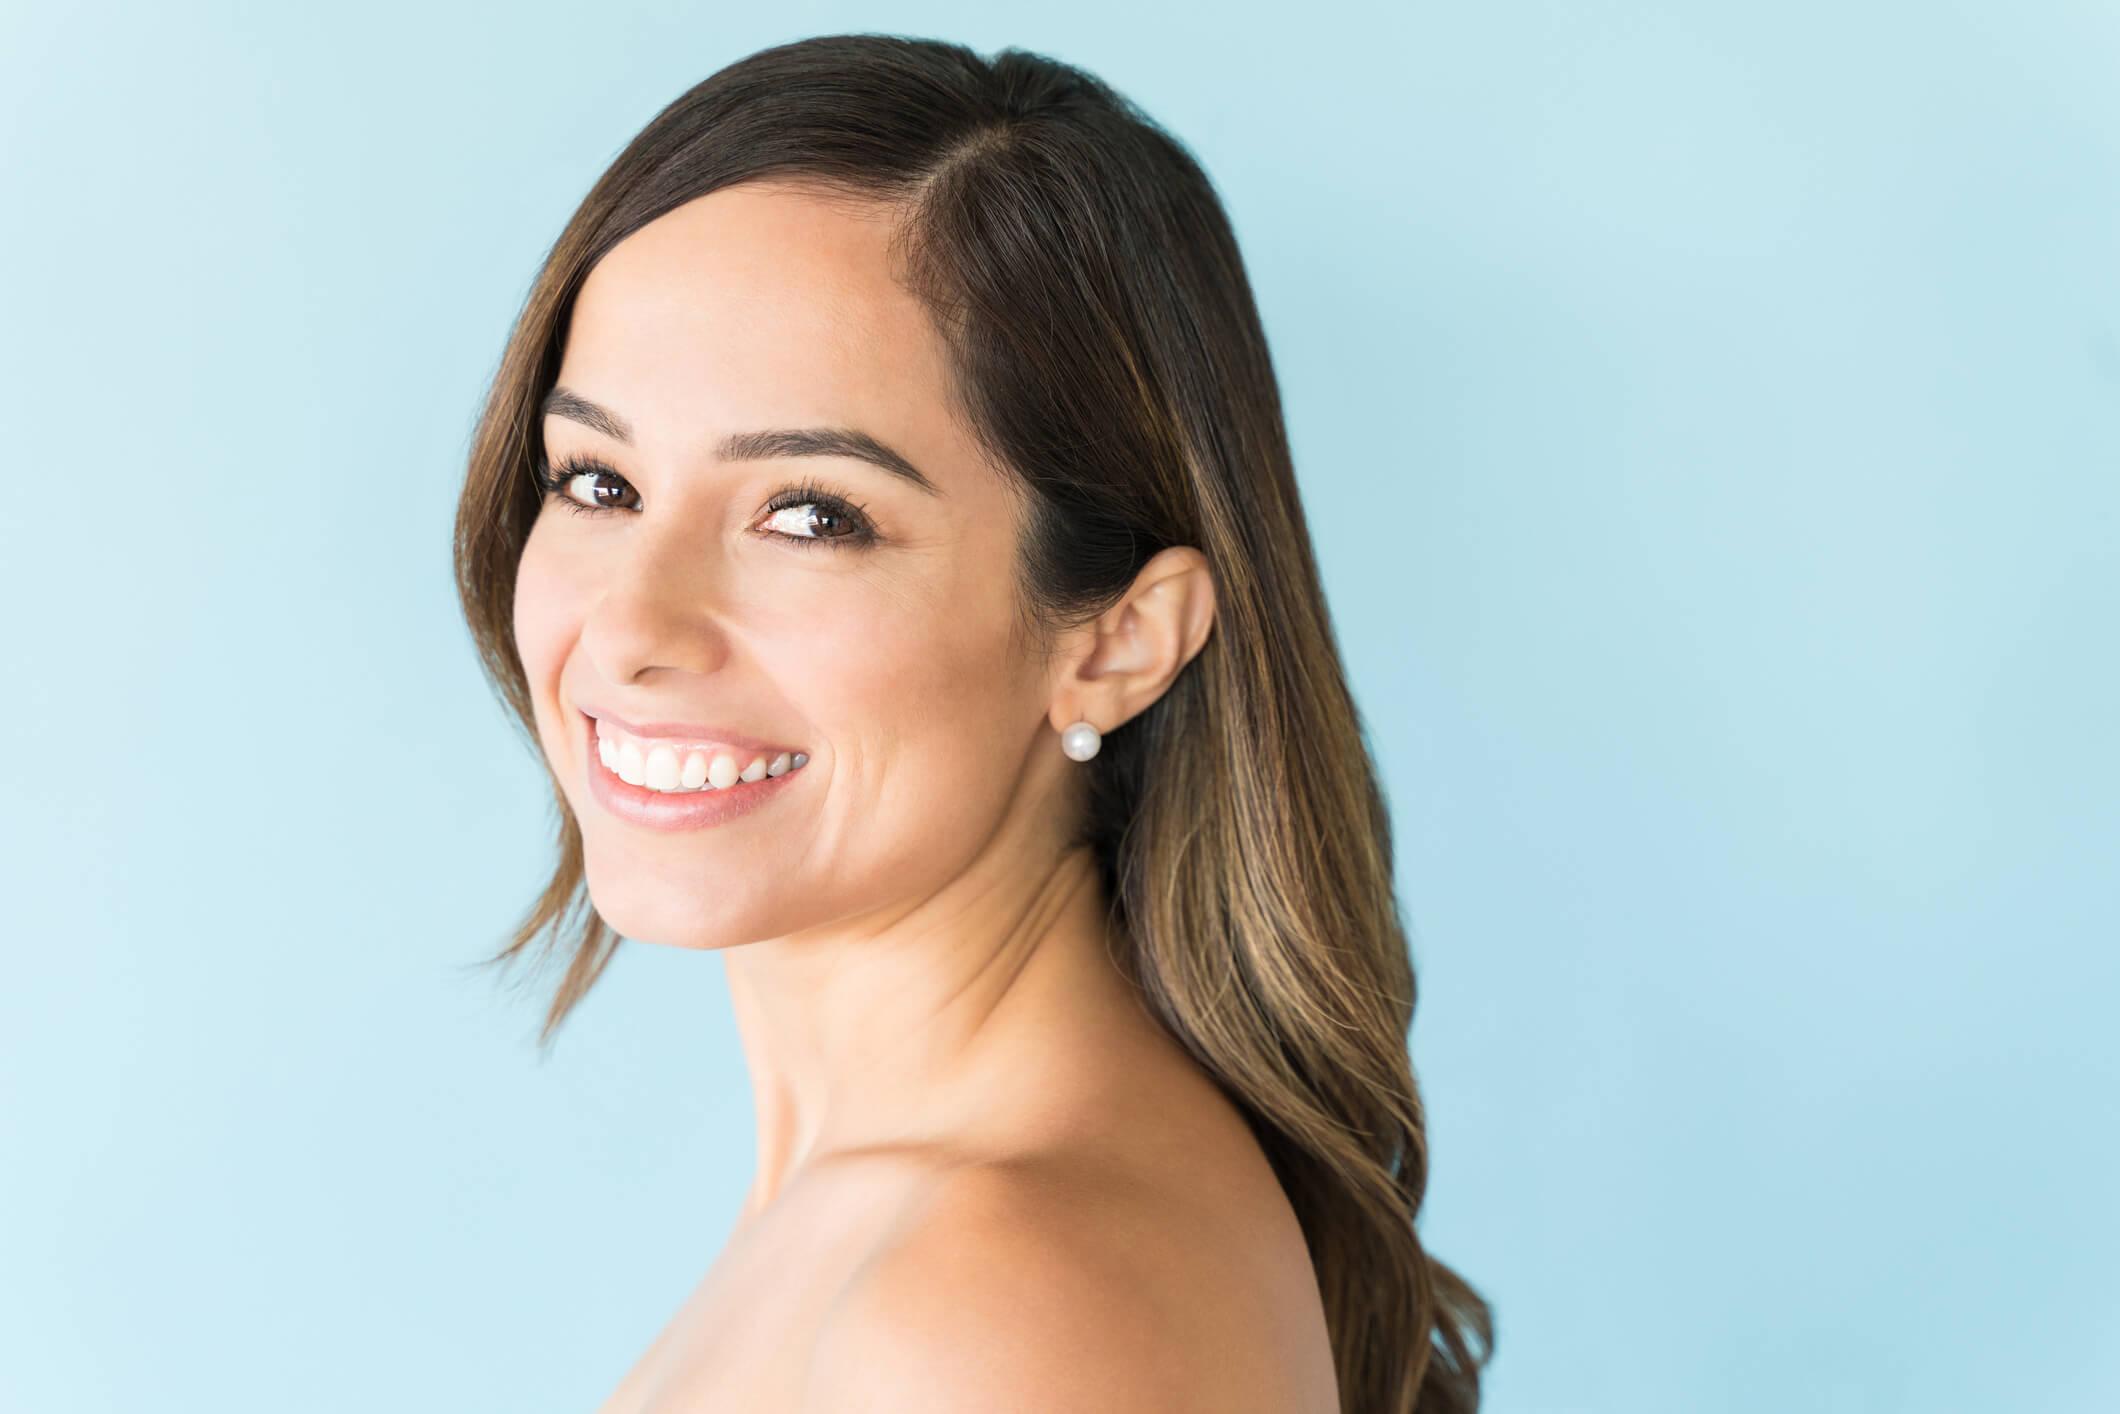 portrait-of-good-looking-happy-female